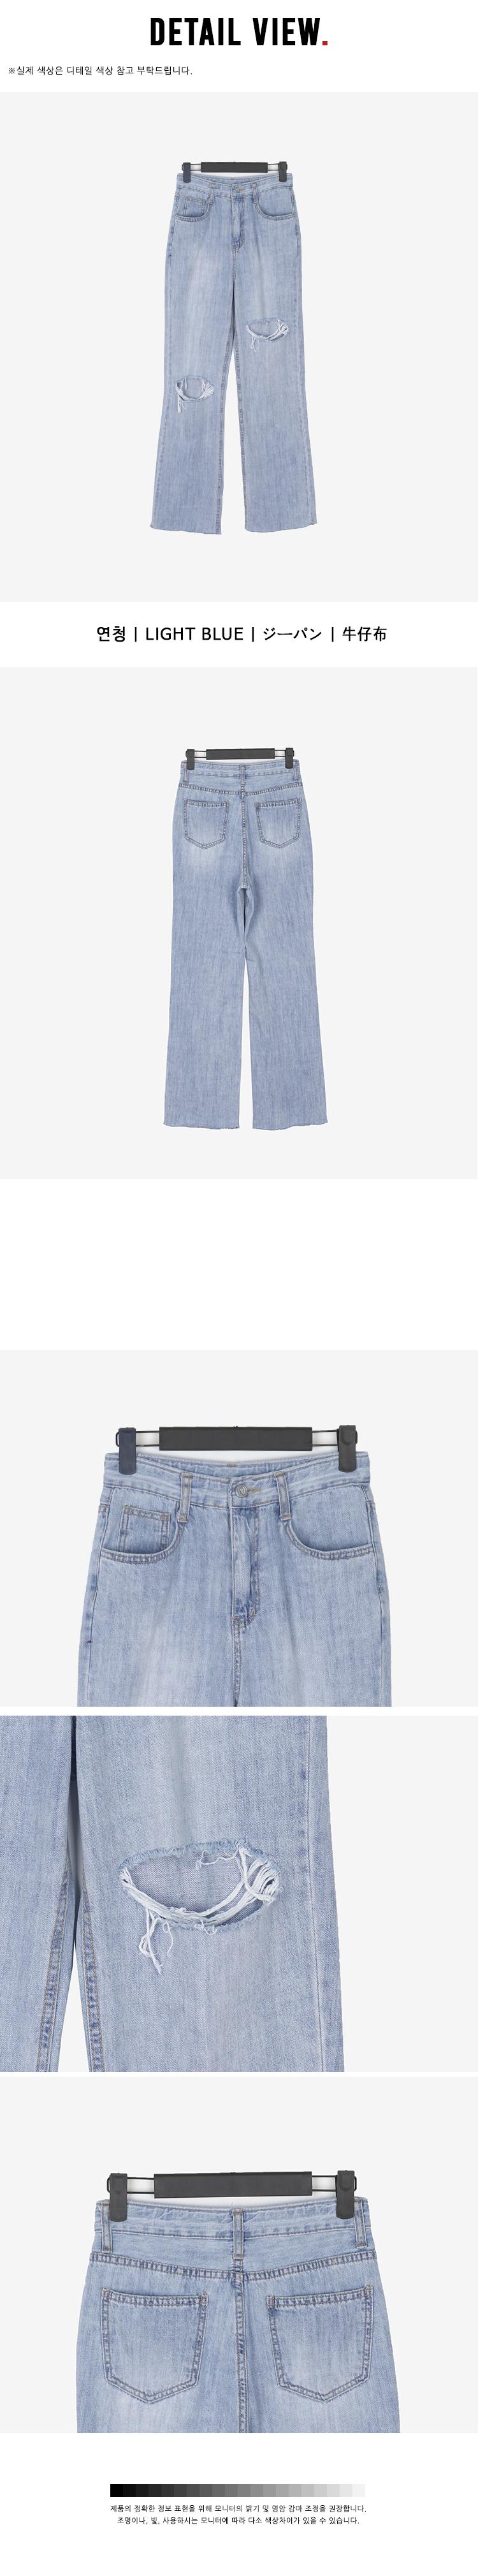 Reddenly Damage Date Denim Pants